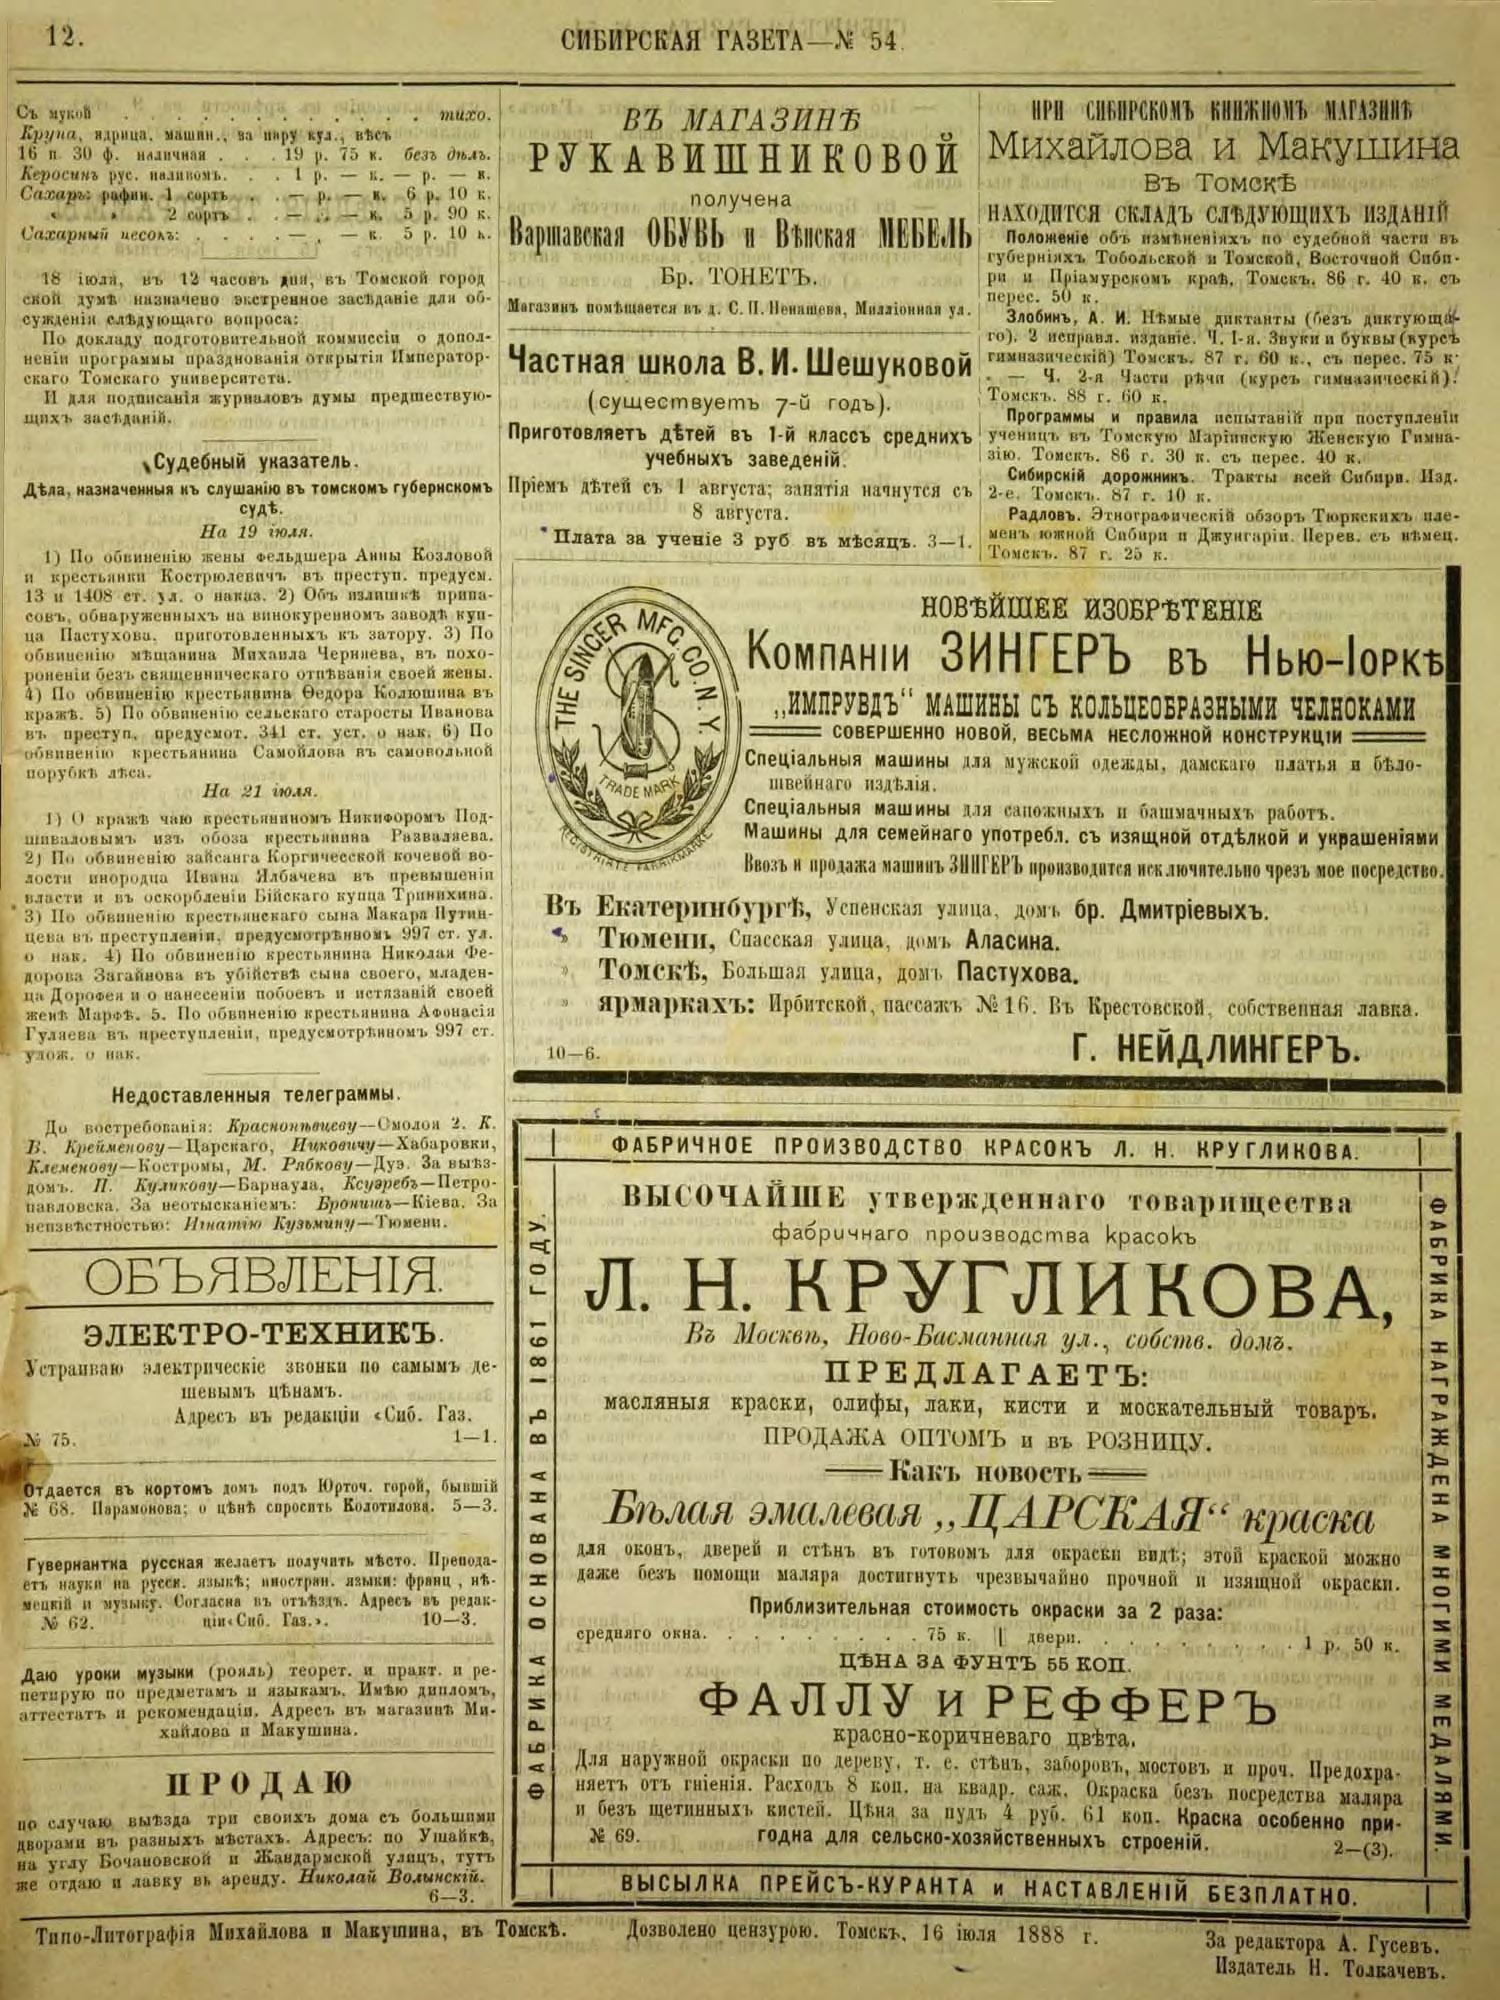 NFS Shift для андроид (взлом на деньги) - Tegra-Market.ru.